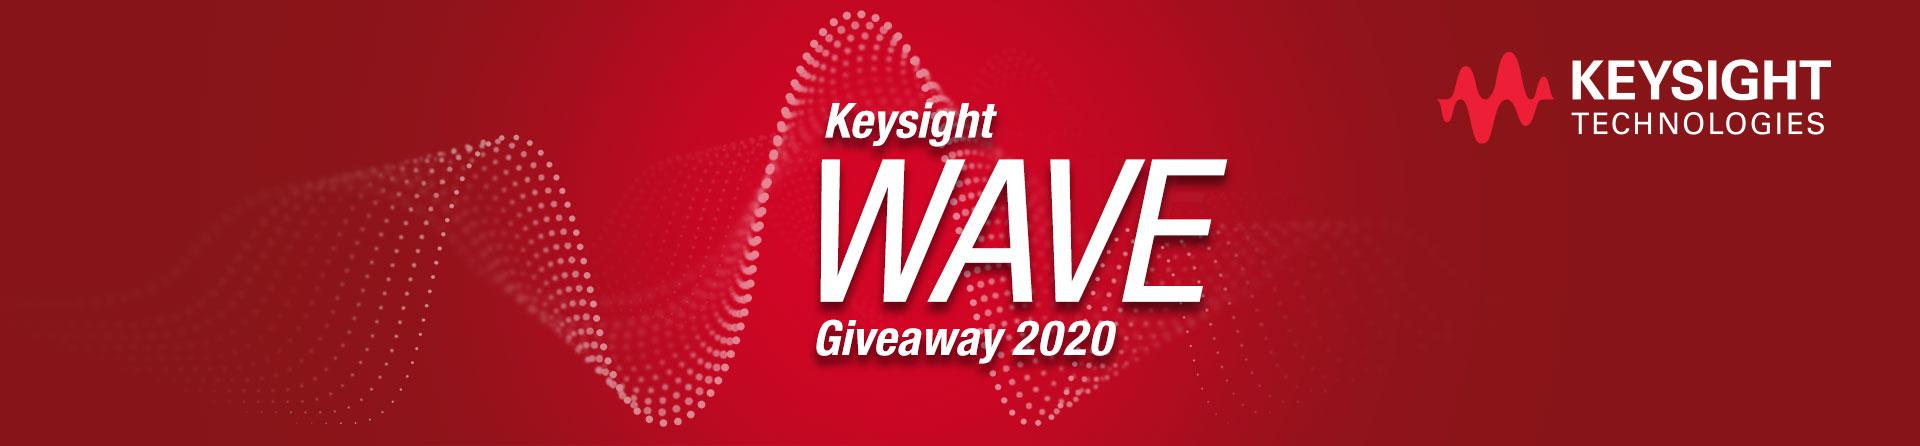 Keysight Giveaway